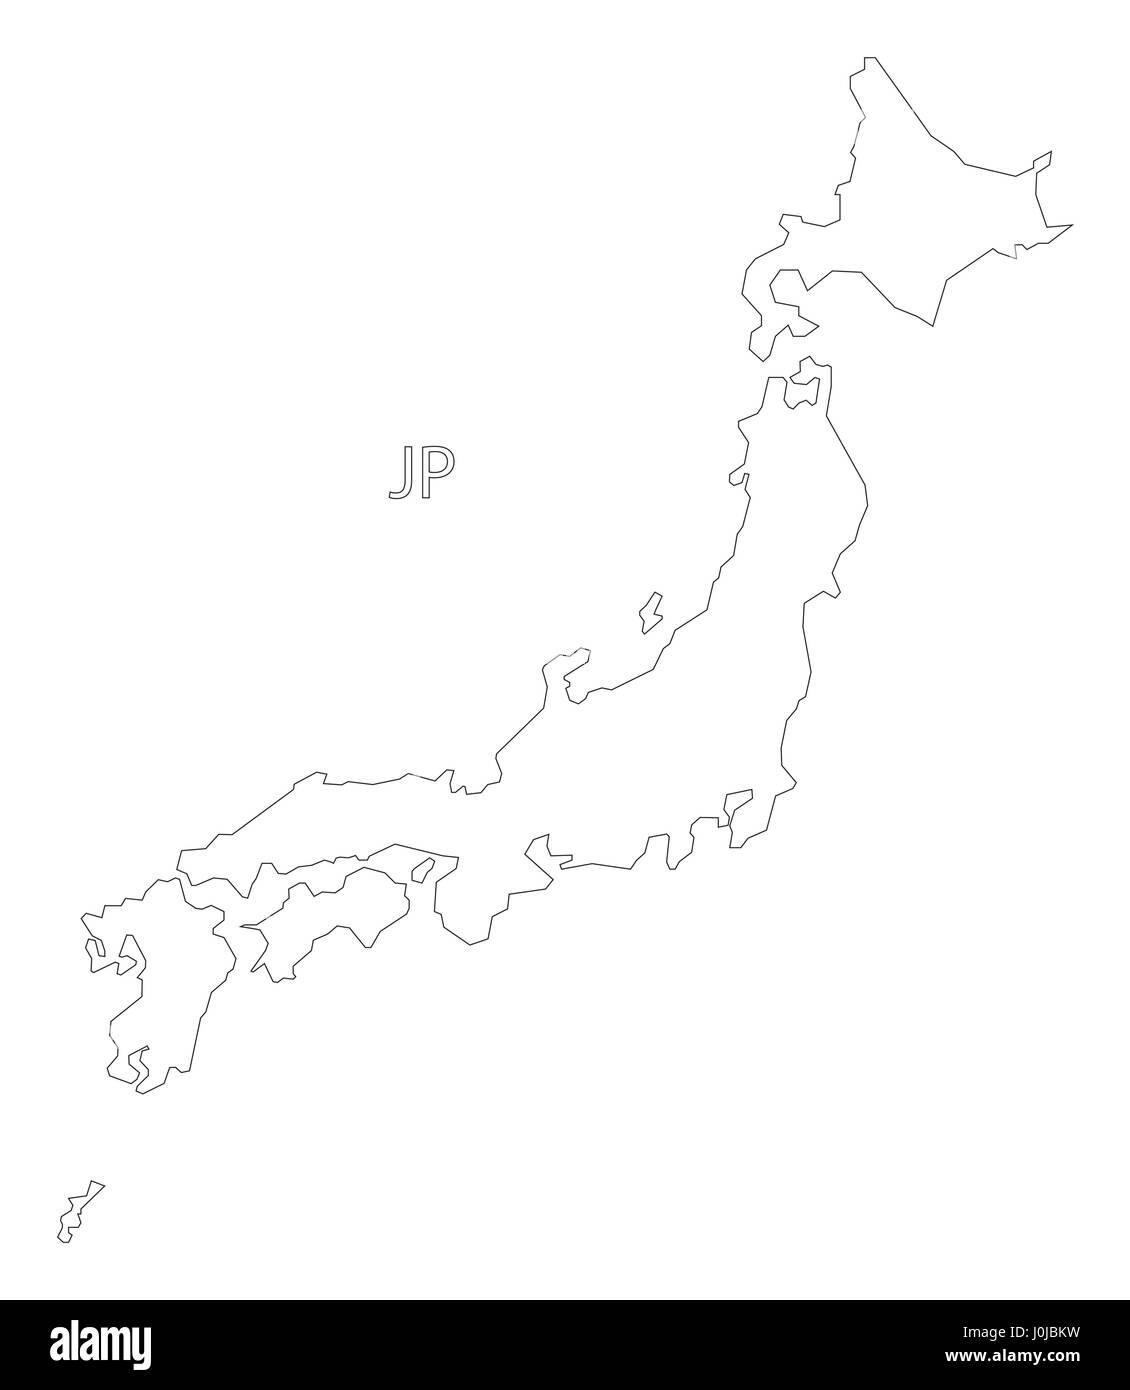 Japan Outline Silhouette Map Illustration Stock Vector Art - Japan map outline